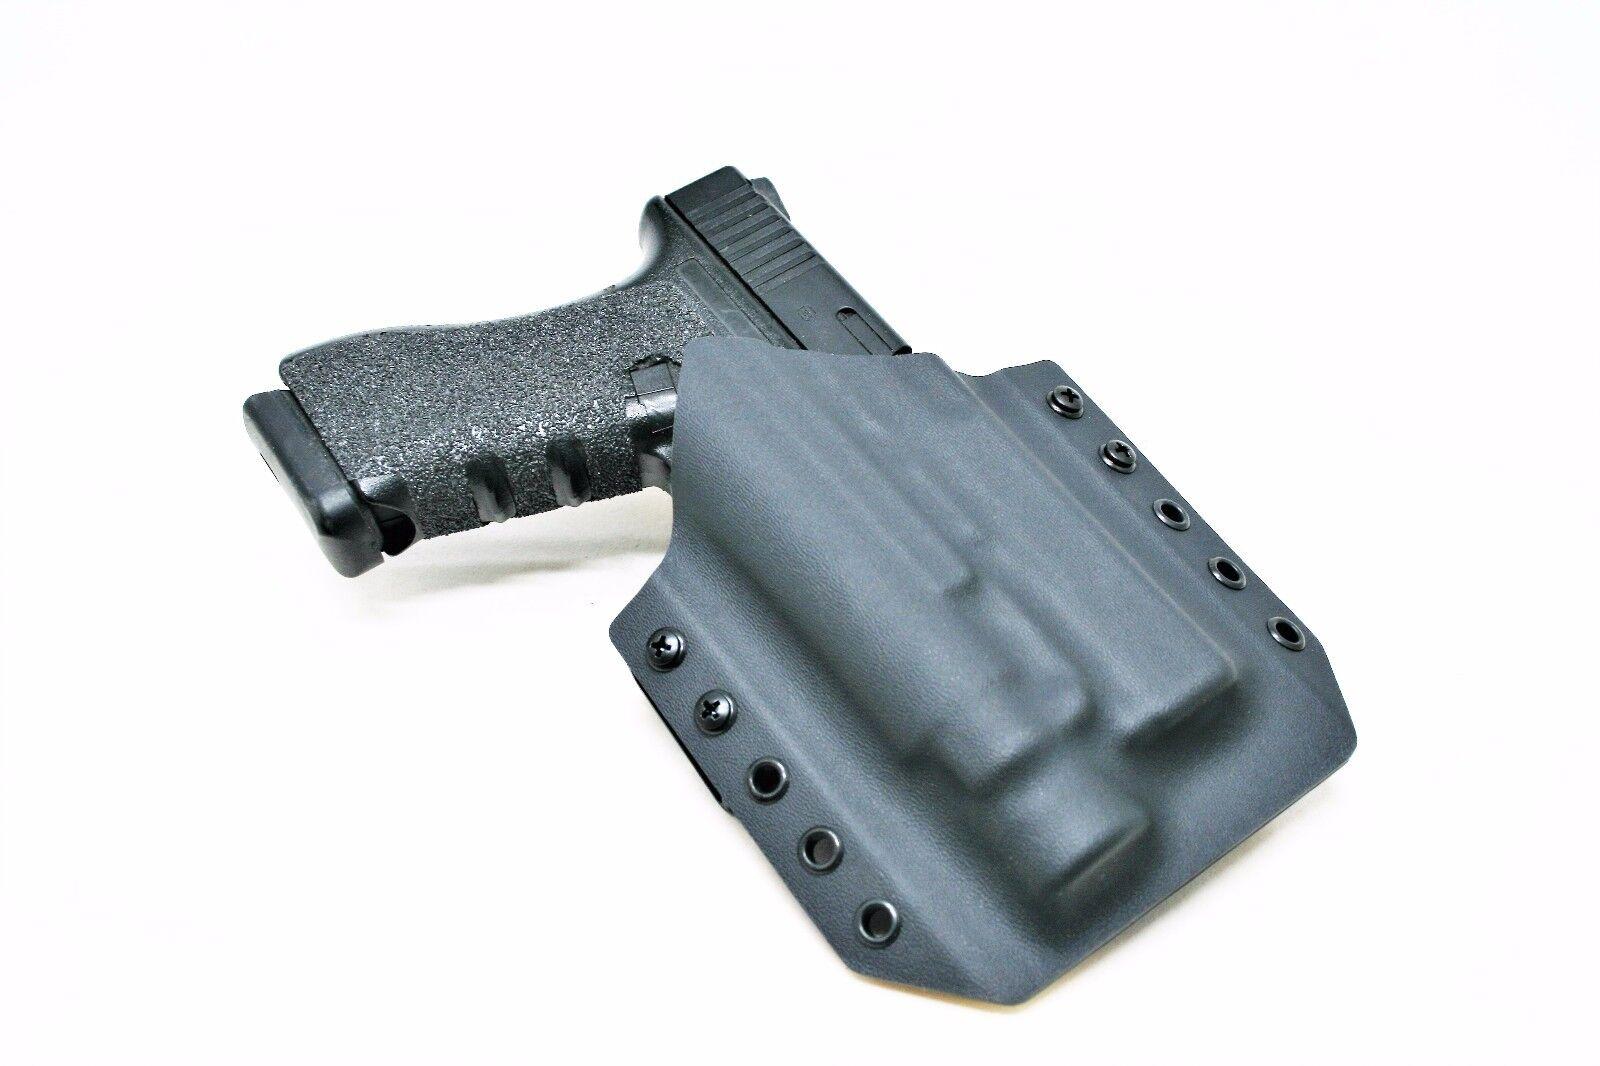 Light bearing Kydex Holster- for Glock 17/22- Streamlight TL